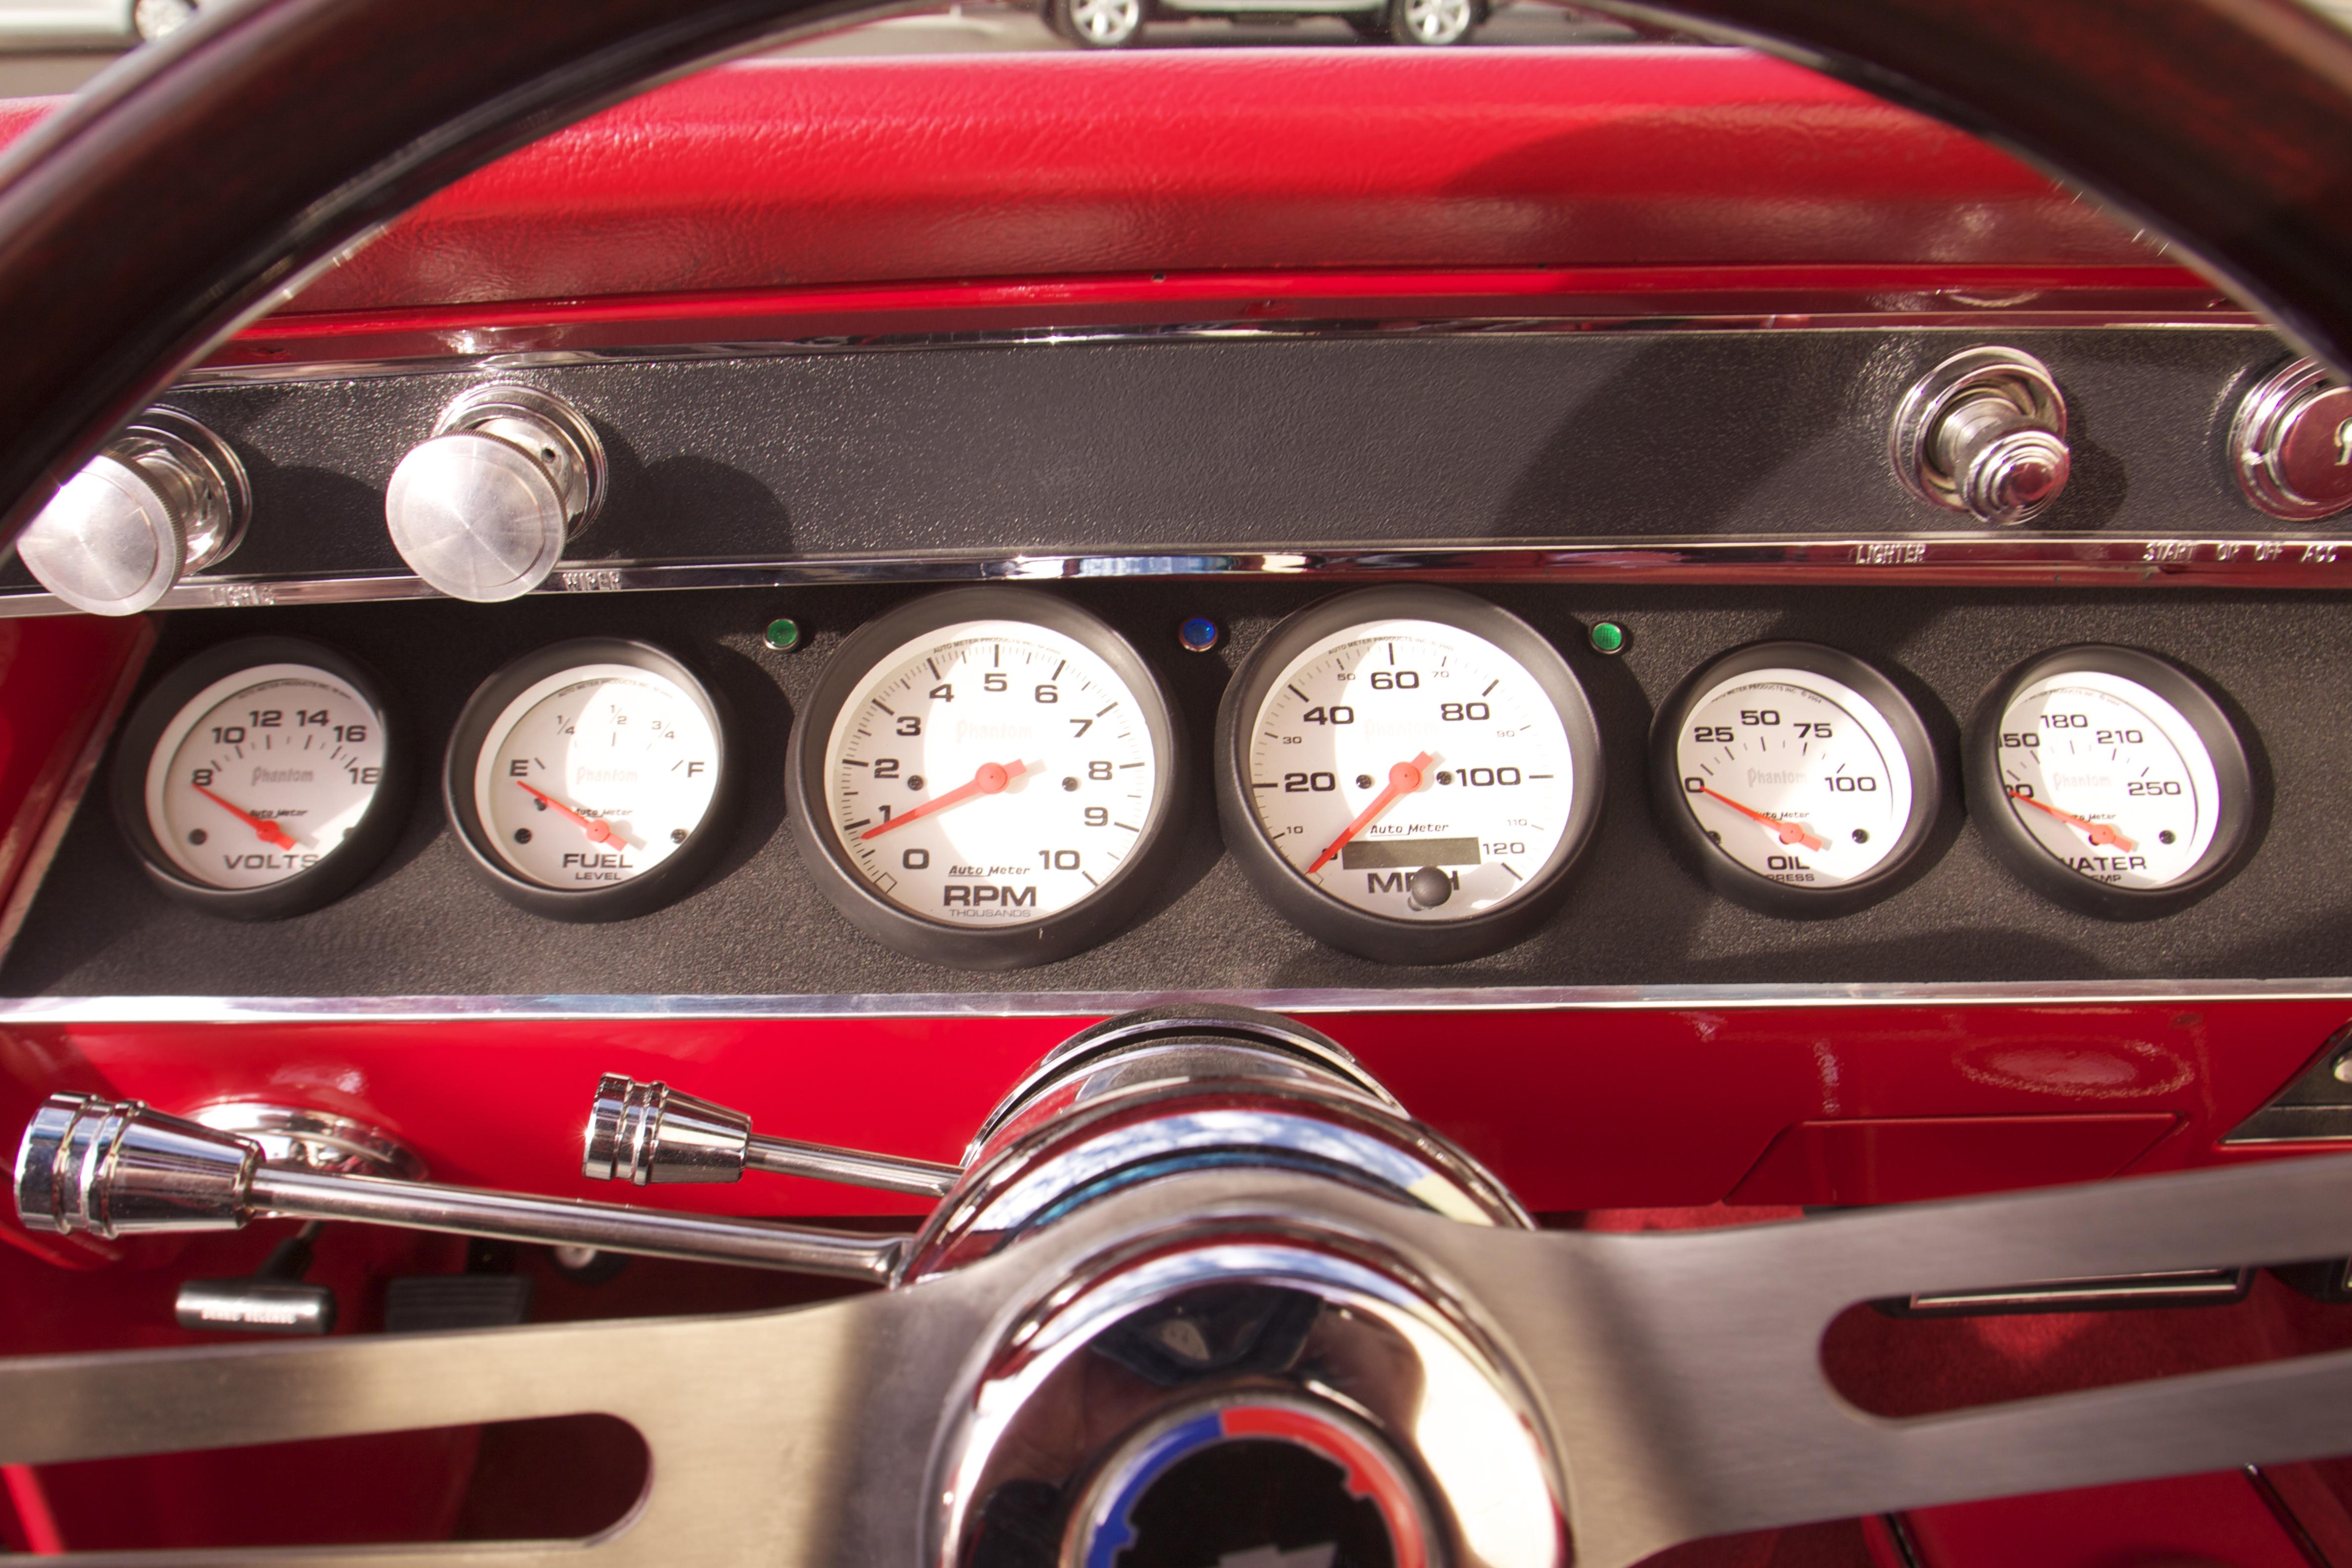 Nancy's 1966 Chevelle - Hot Rods by Dean